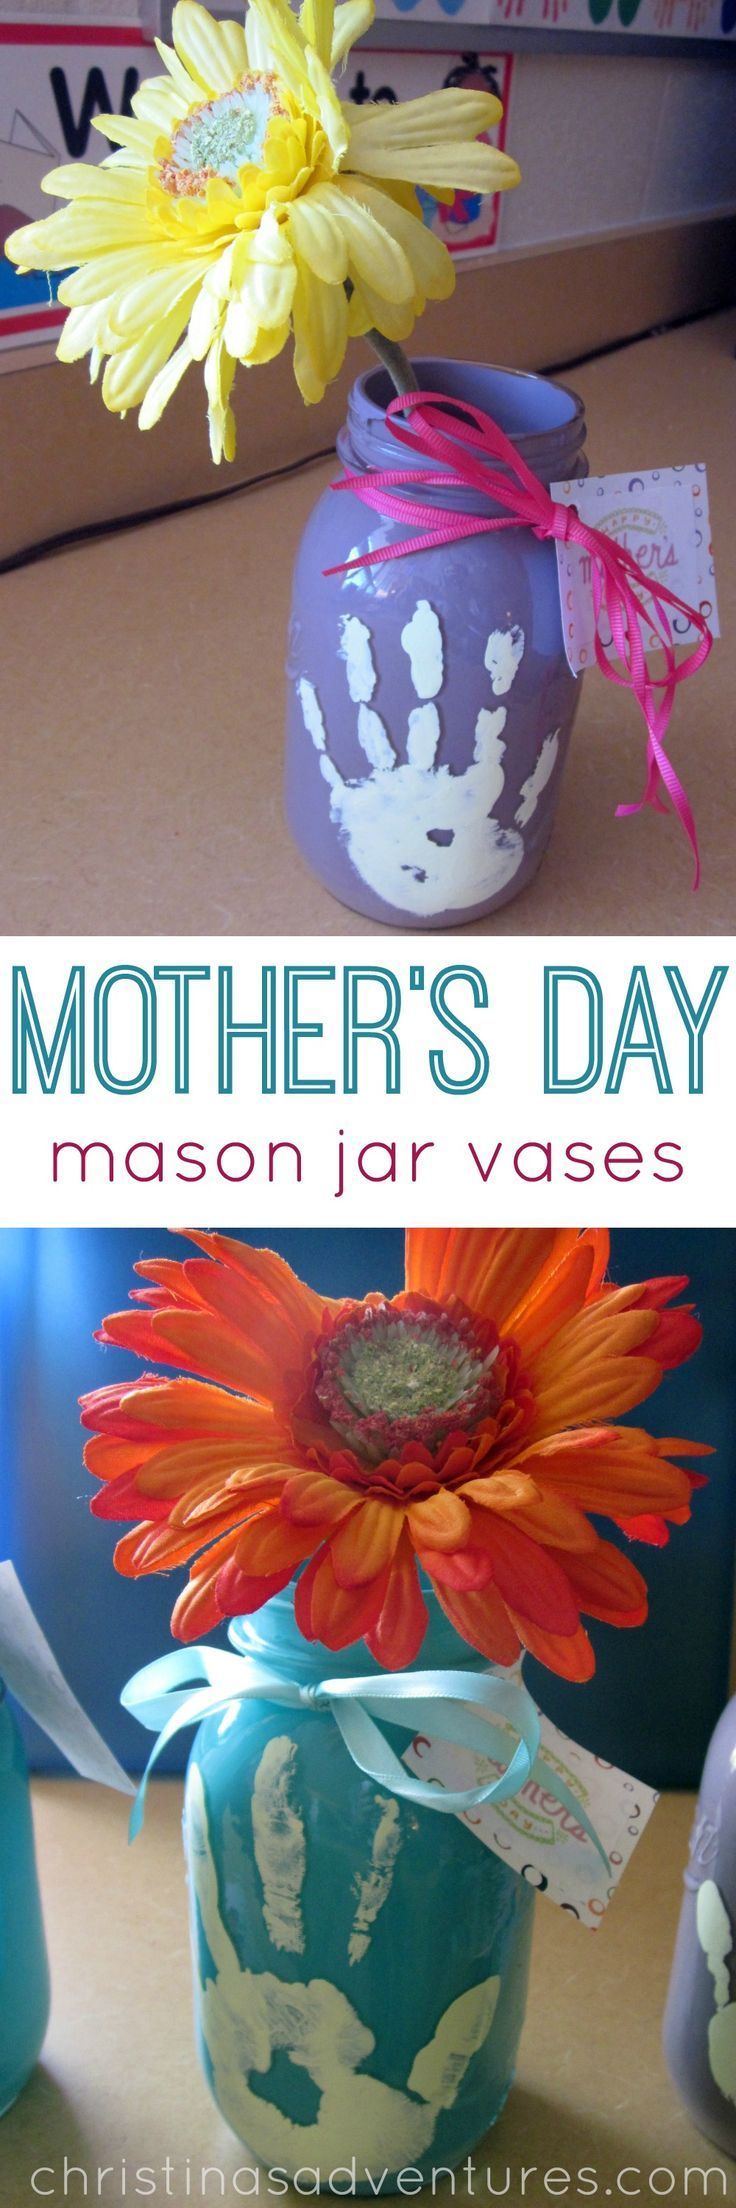 Easy kids craft: Hand print Mother's Day mason jar vases  #MothersDay #MasonJar #kidscraft